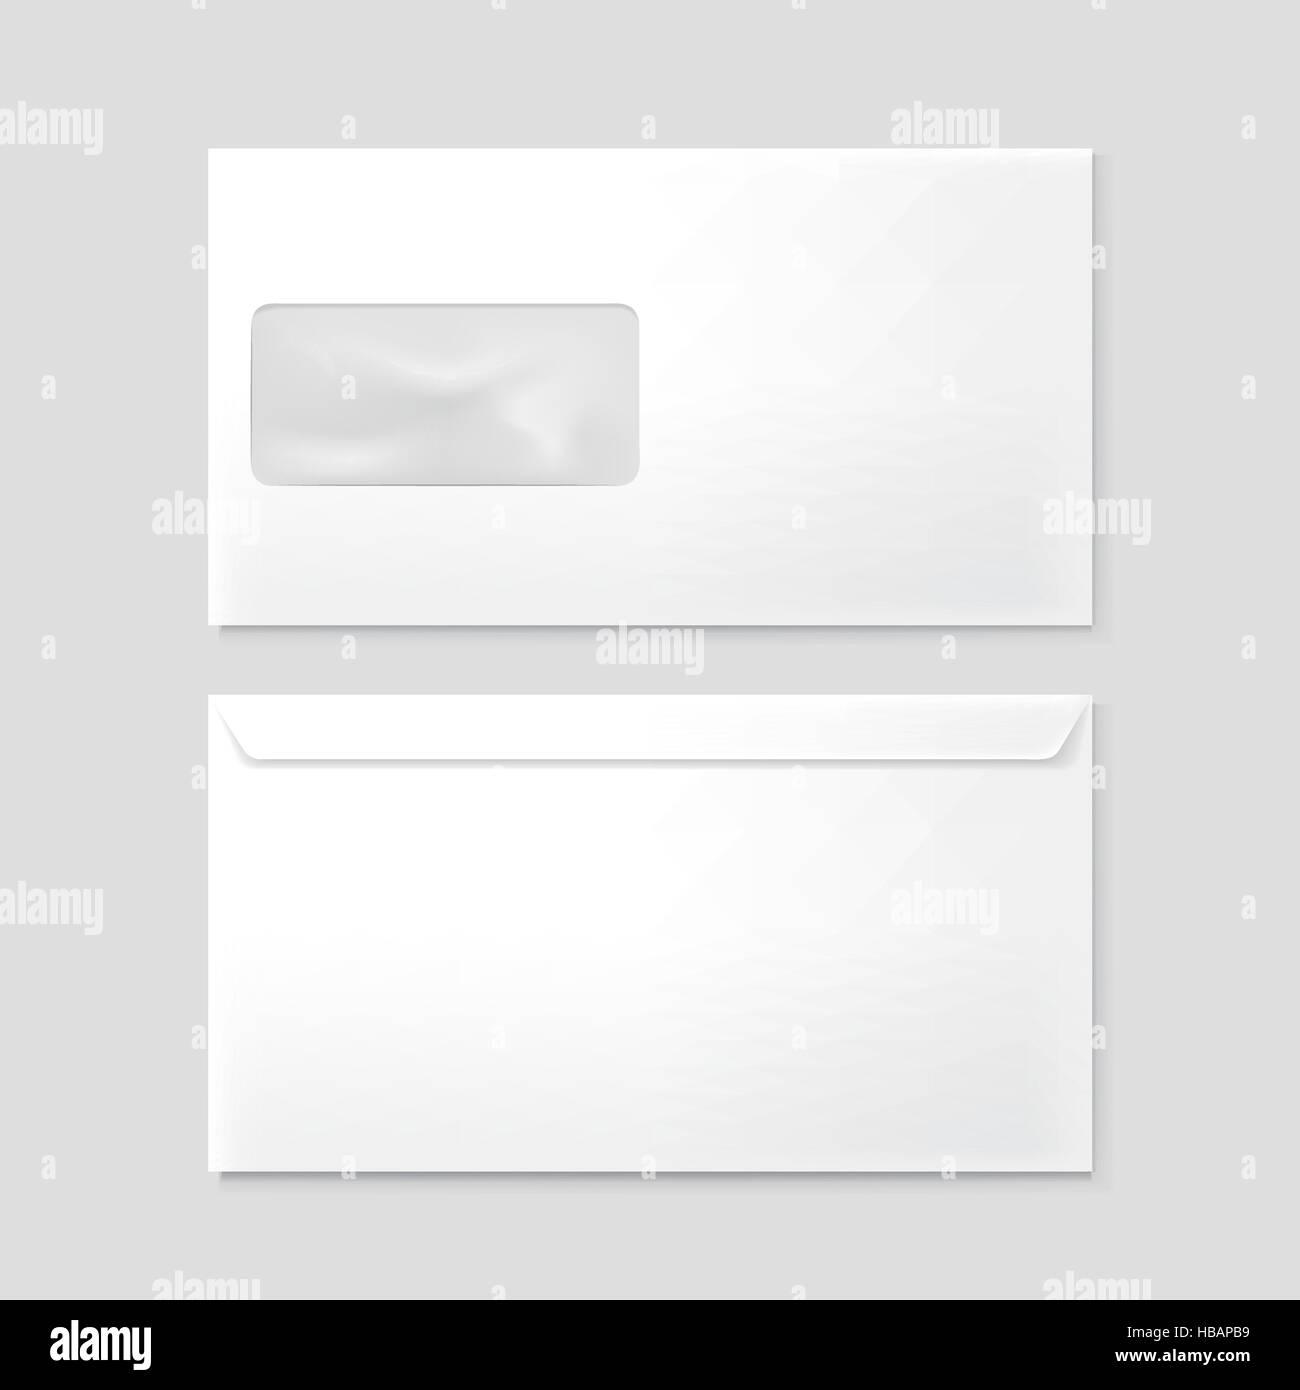 blank envelopes with window isolated on grey background - Stock Image